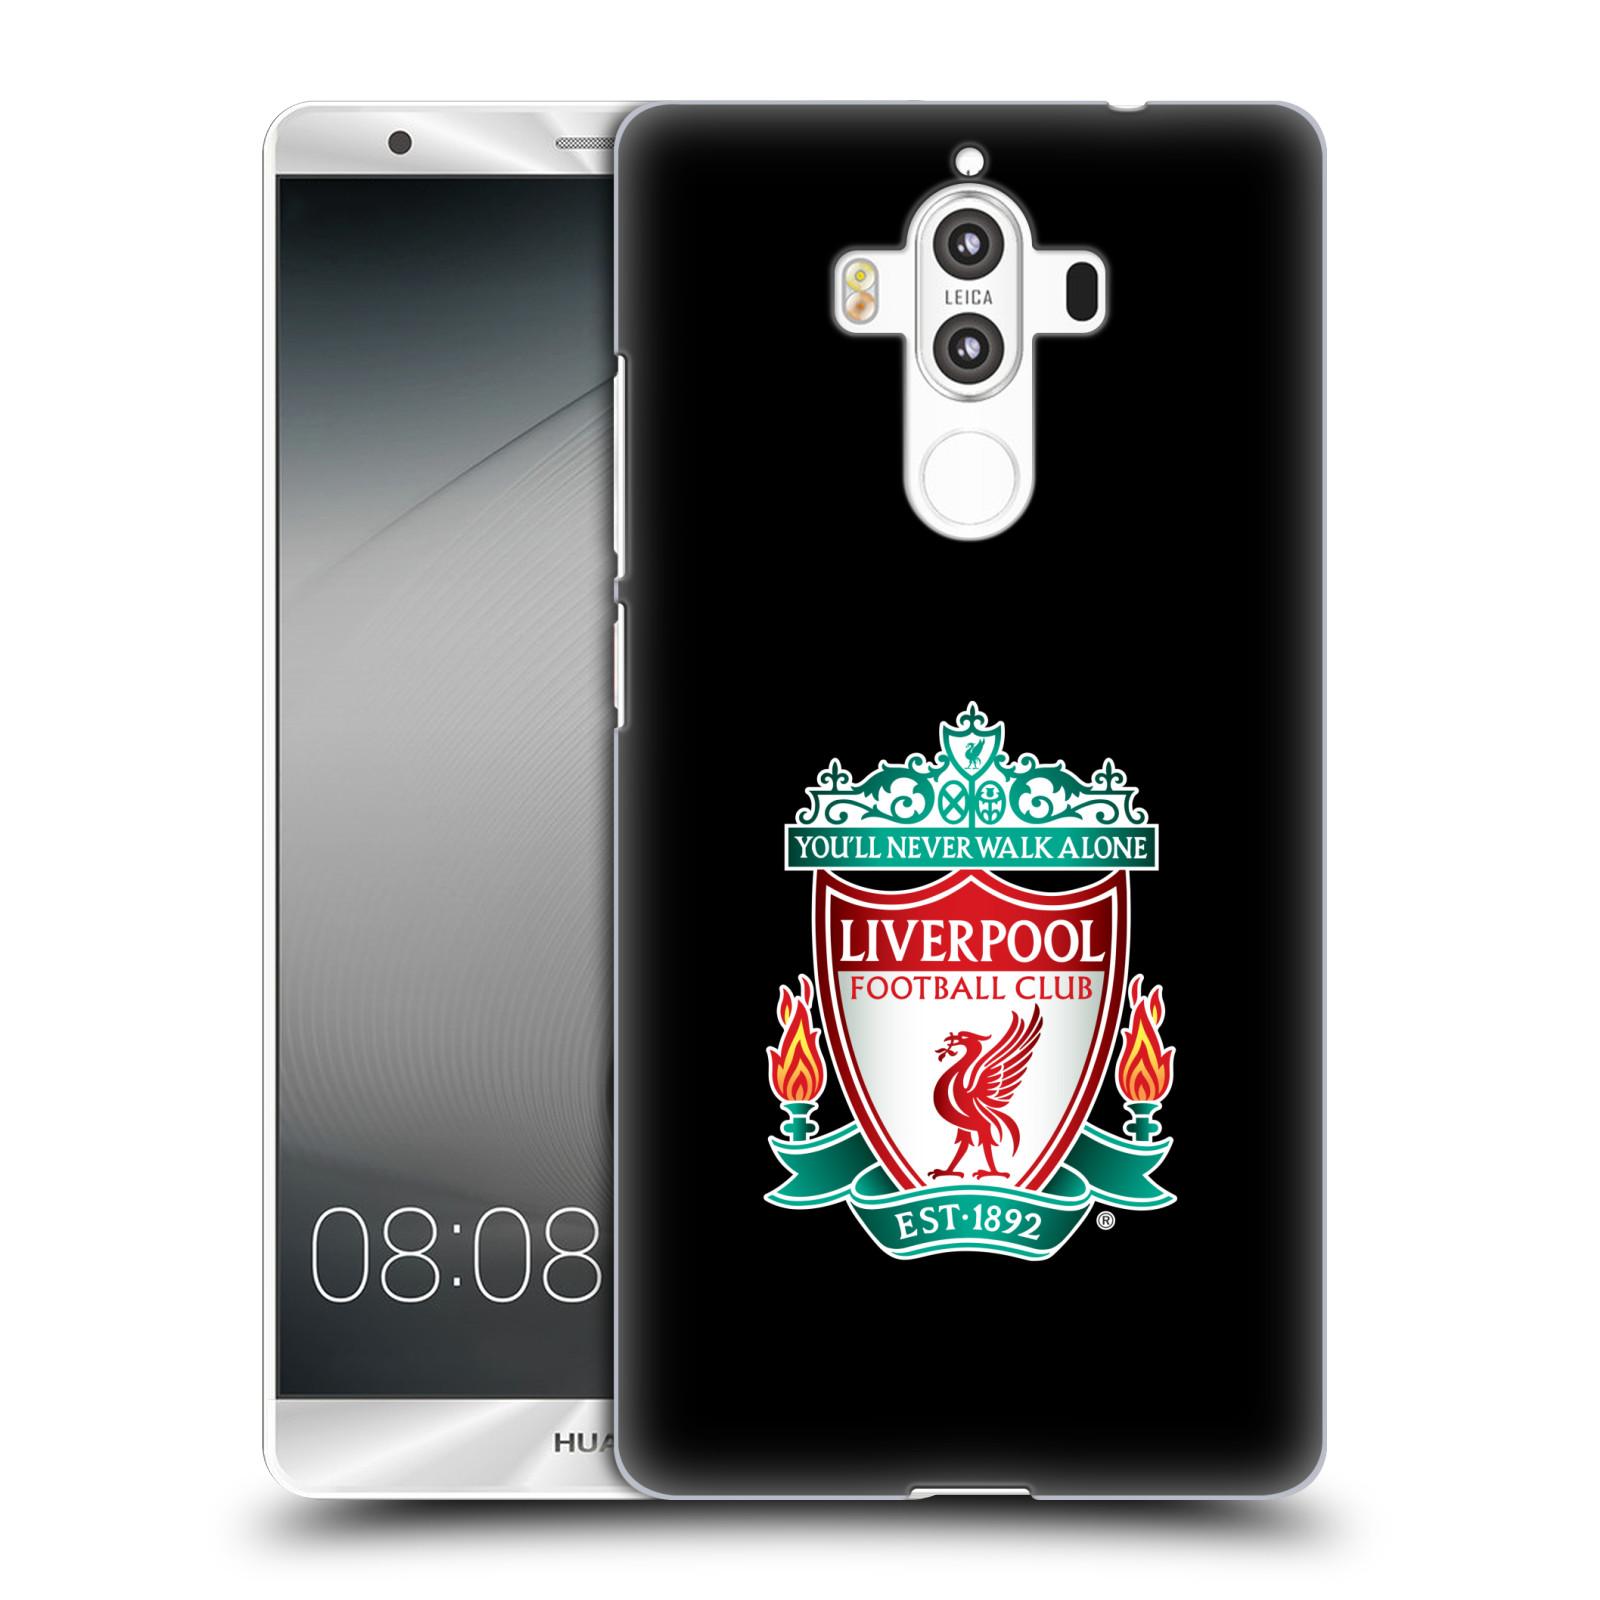 Plastové pouzdro na mobil Huawei Mate 9 - Head Case ZNAK LIVERPOOL FC OFFICIAL BLACK (Plastový kryt či obal na mobilní telefon Liverpool FC Official pro Huawei Mate 9 (Dual SIM))